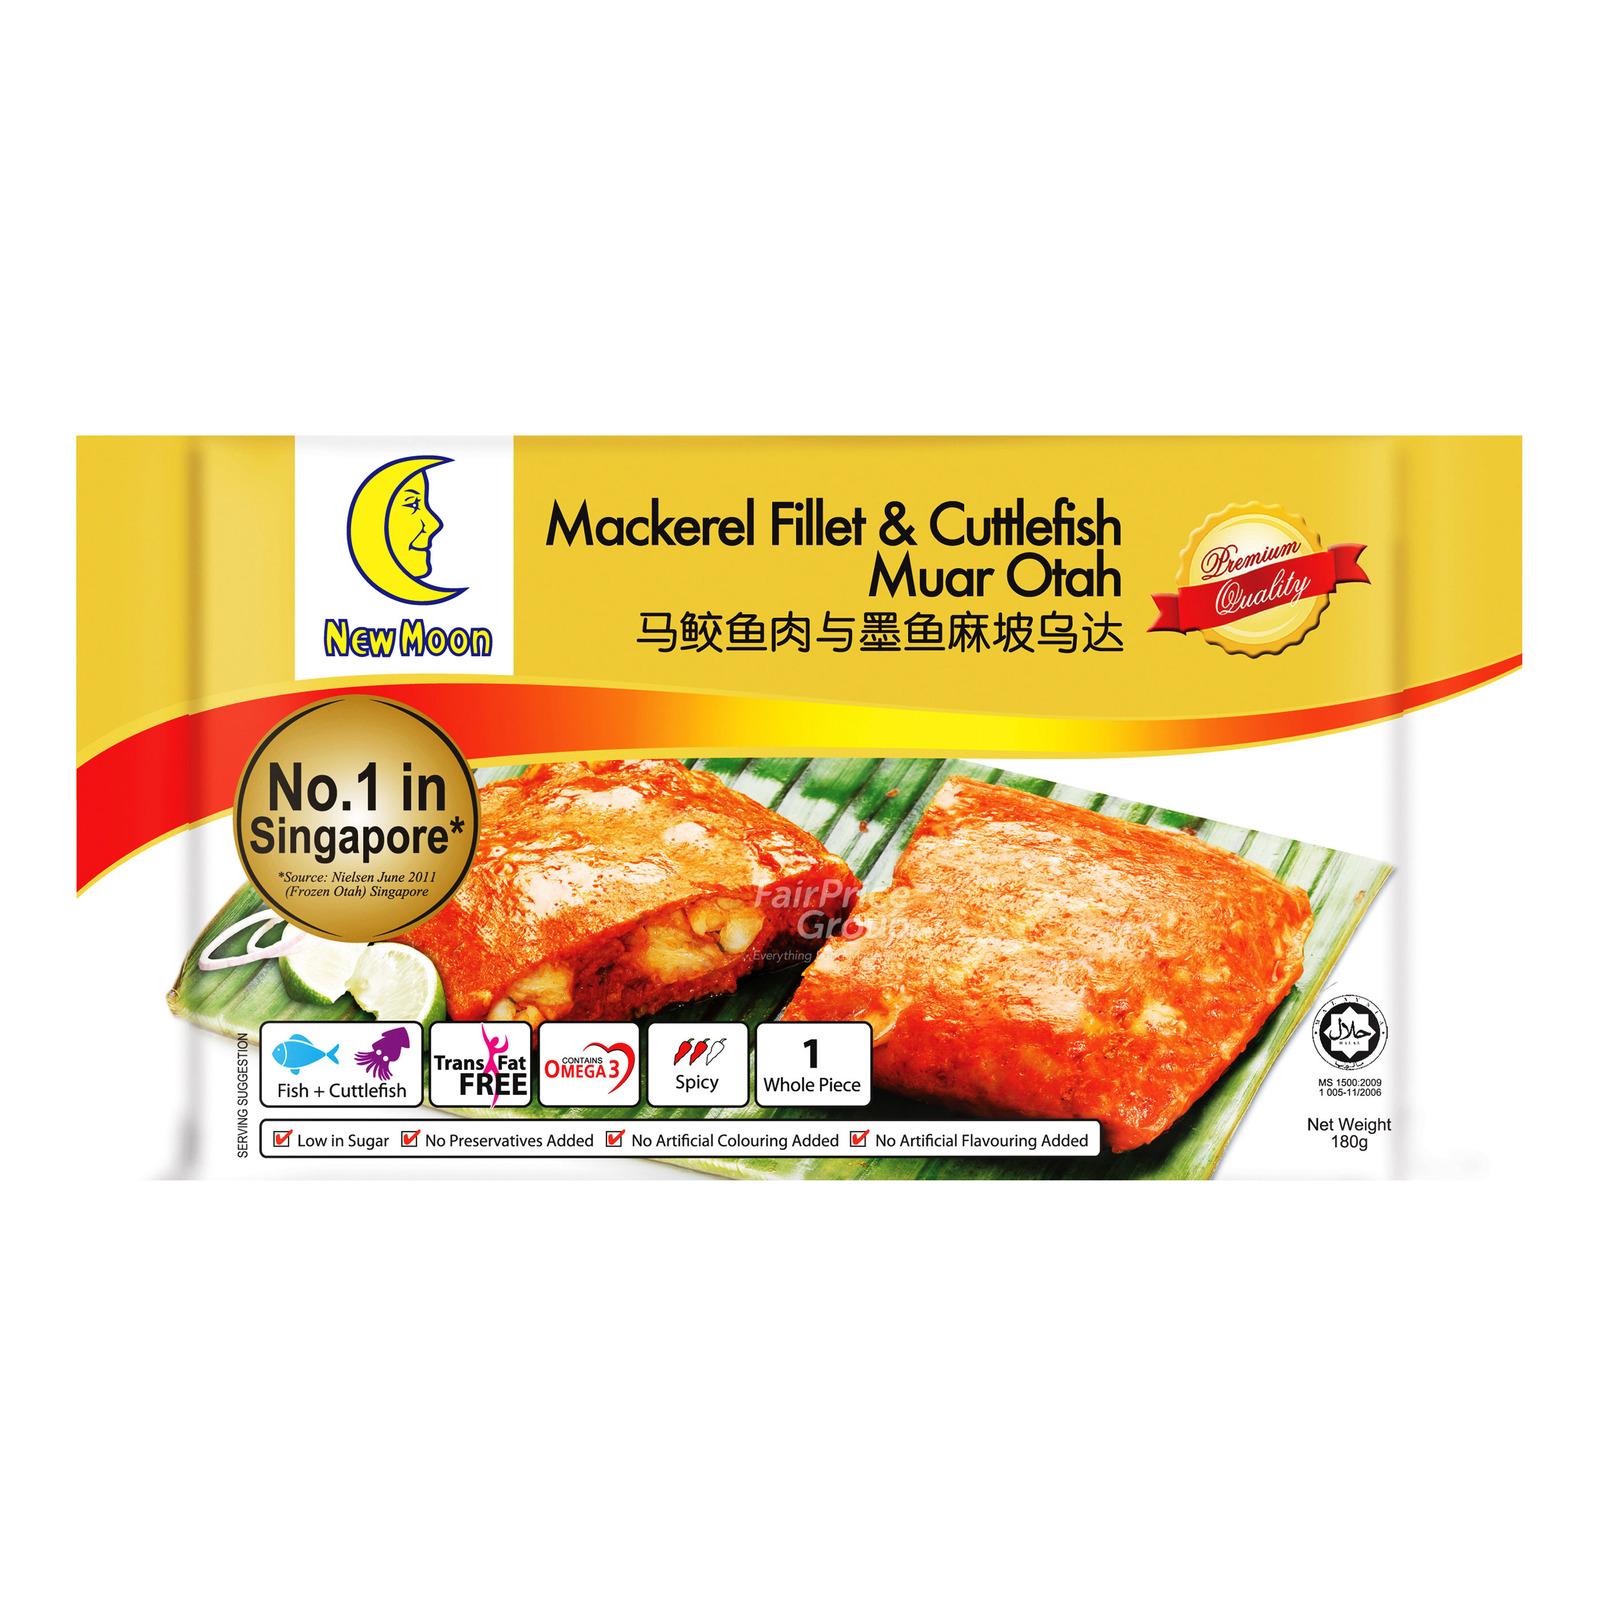 NEW MOON Mackeral Fillet & Cuttlefish Muar Otah 180g